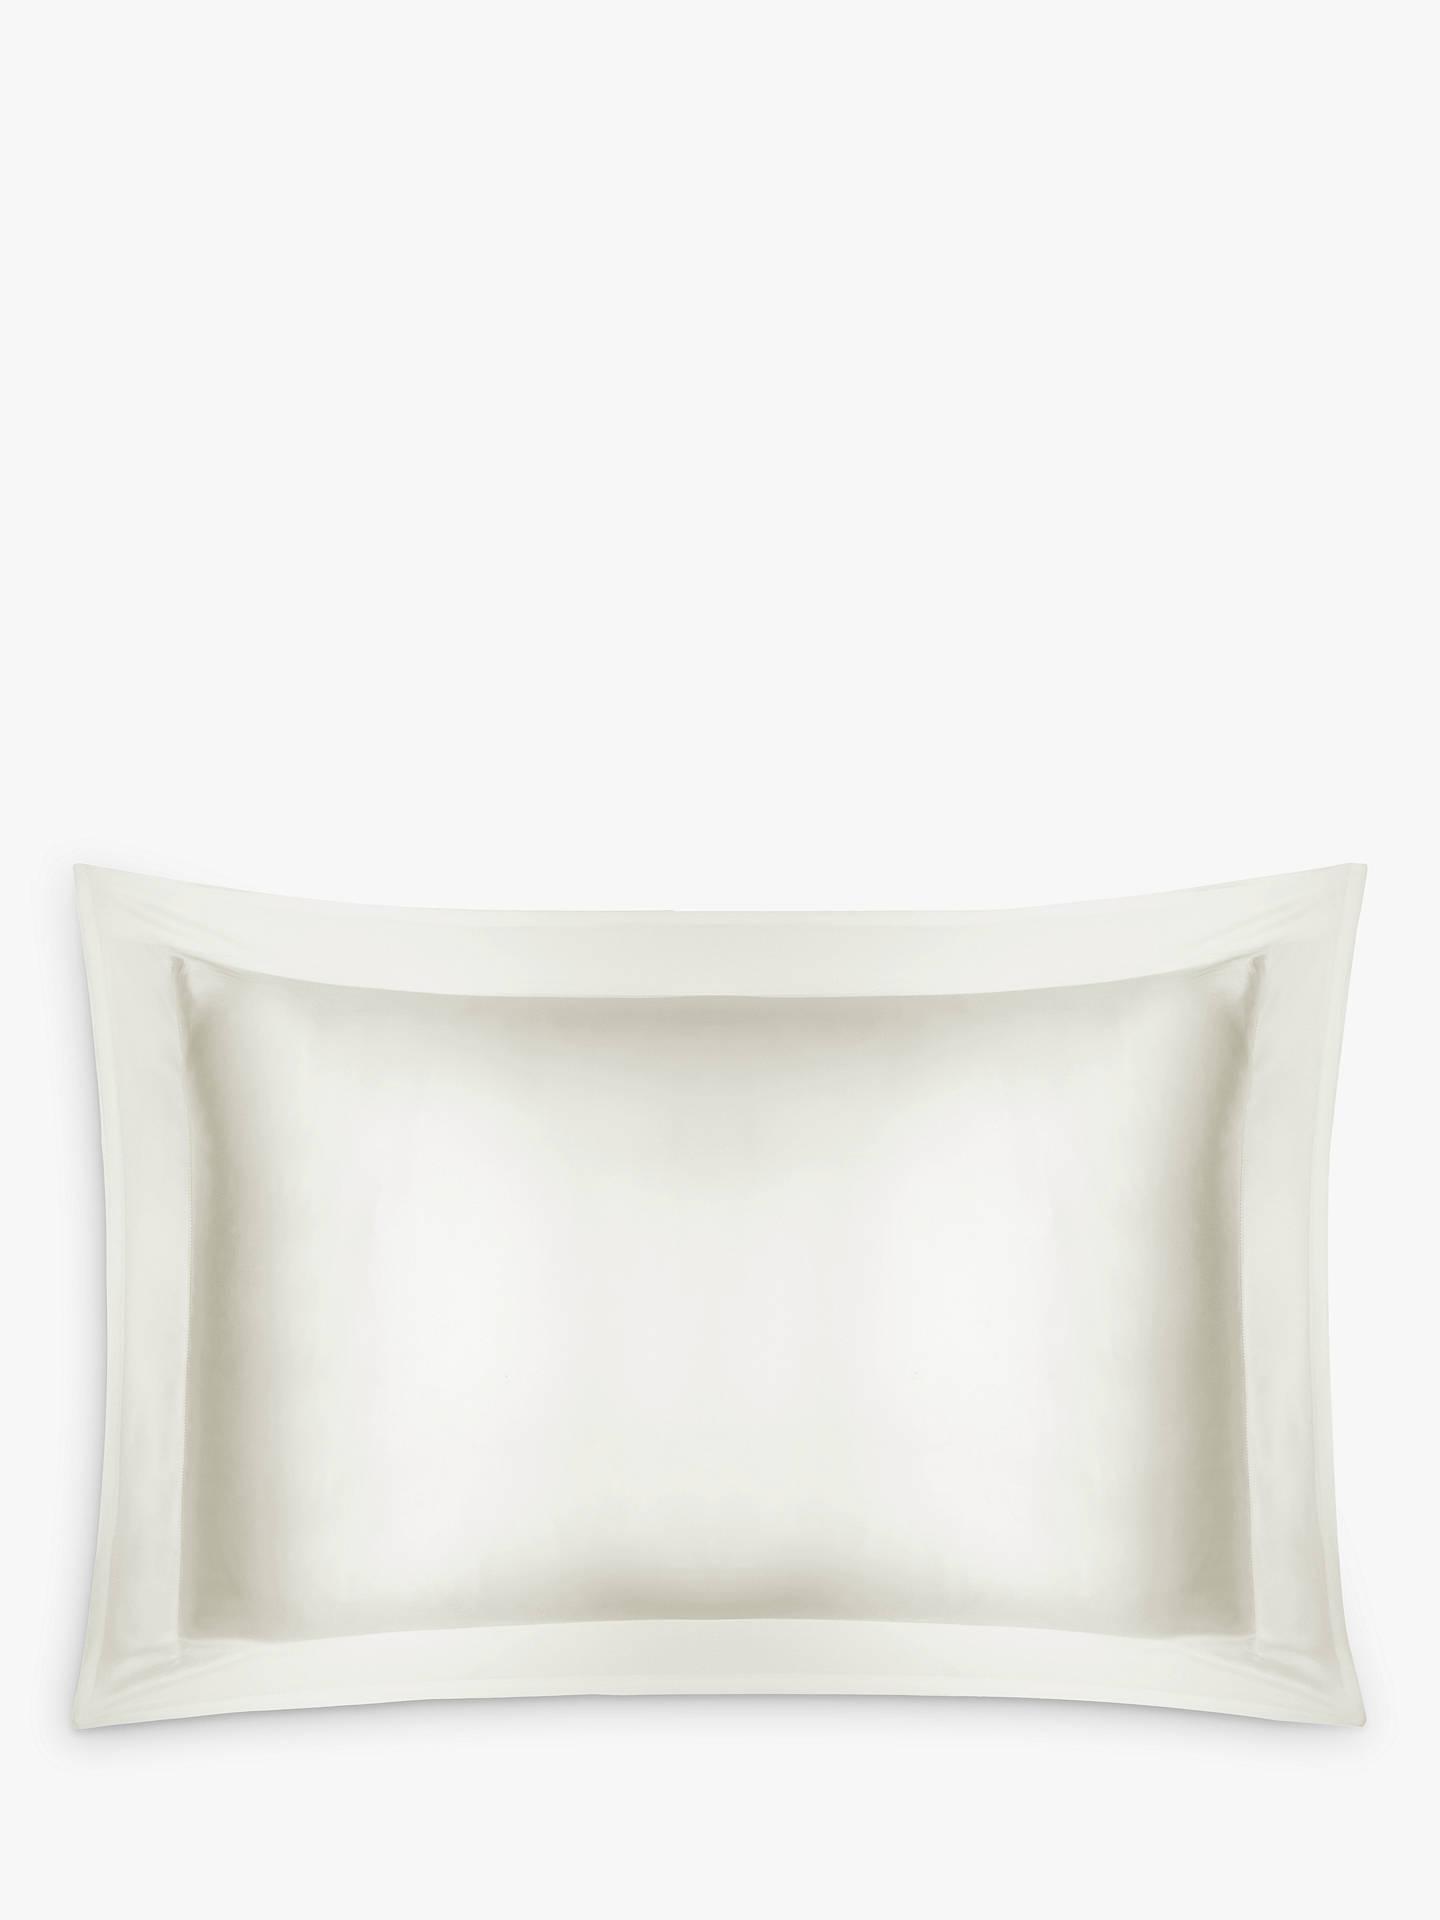 John Lewis Partners Silk Oxford Pillowcase Ivory